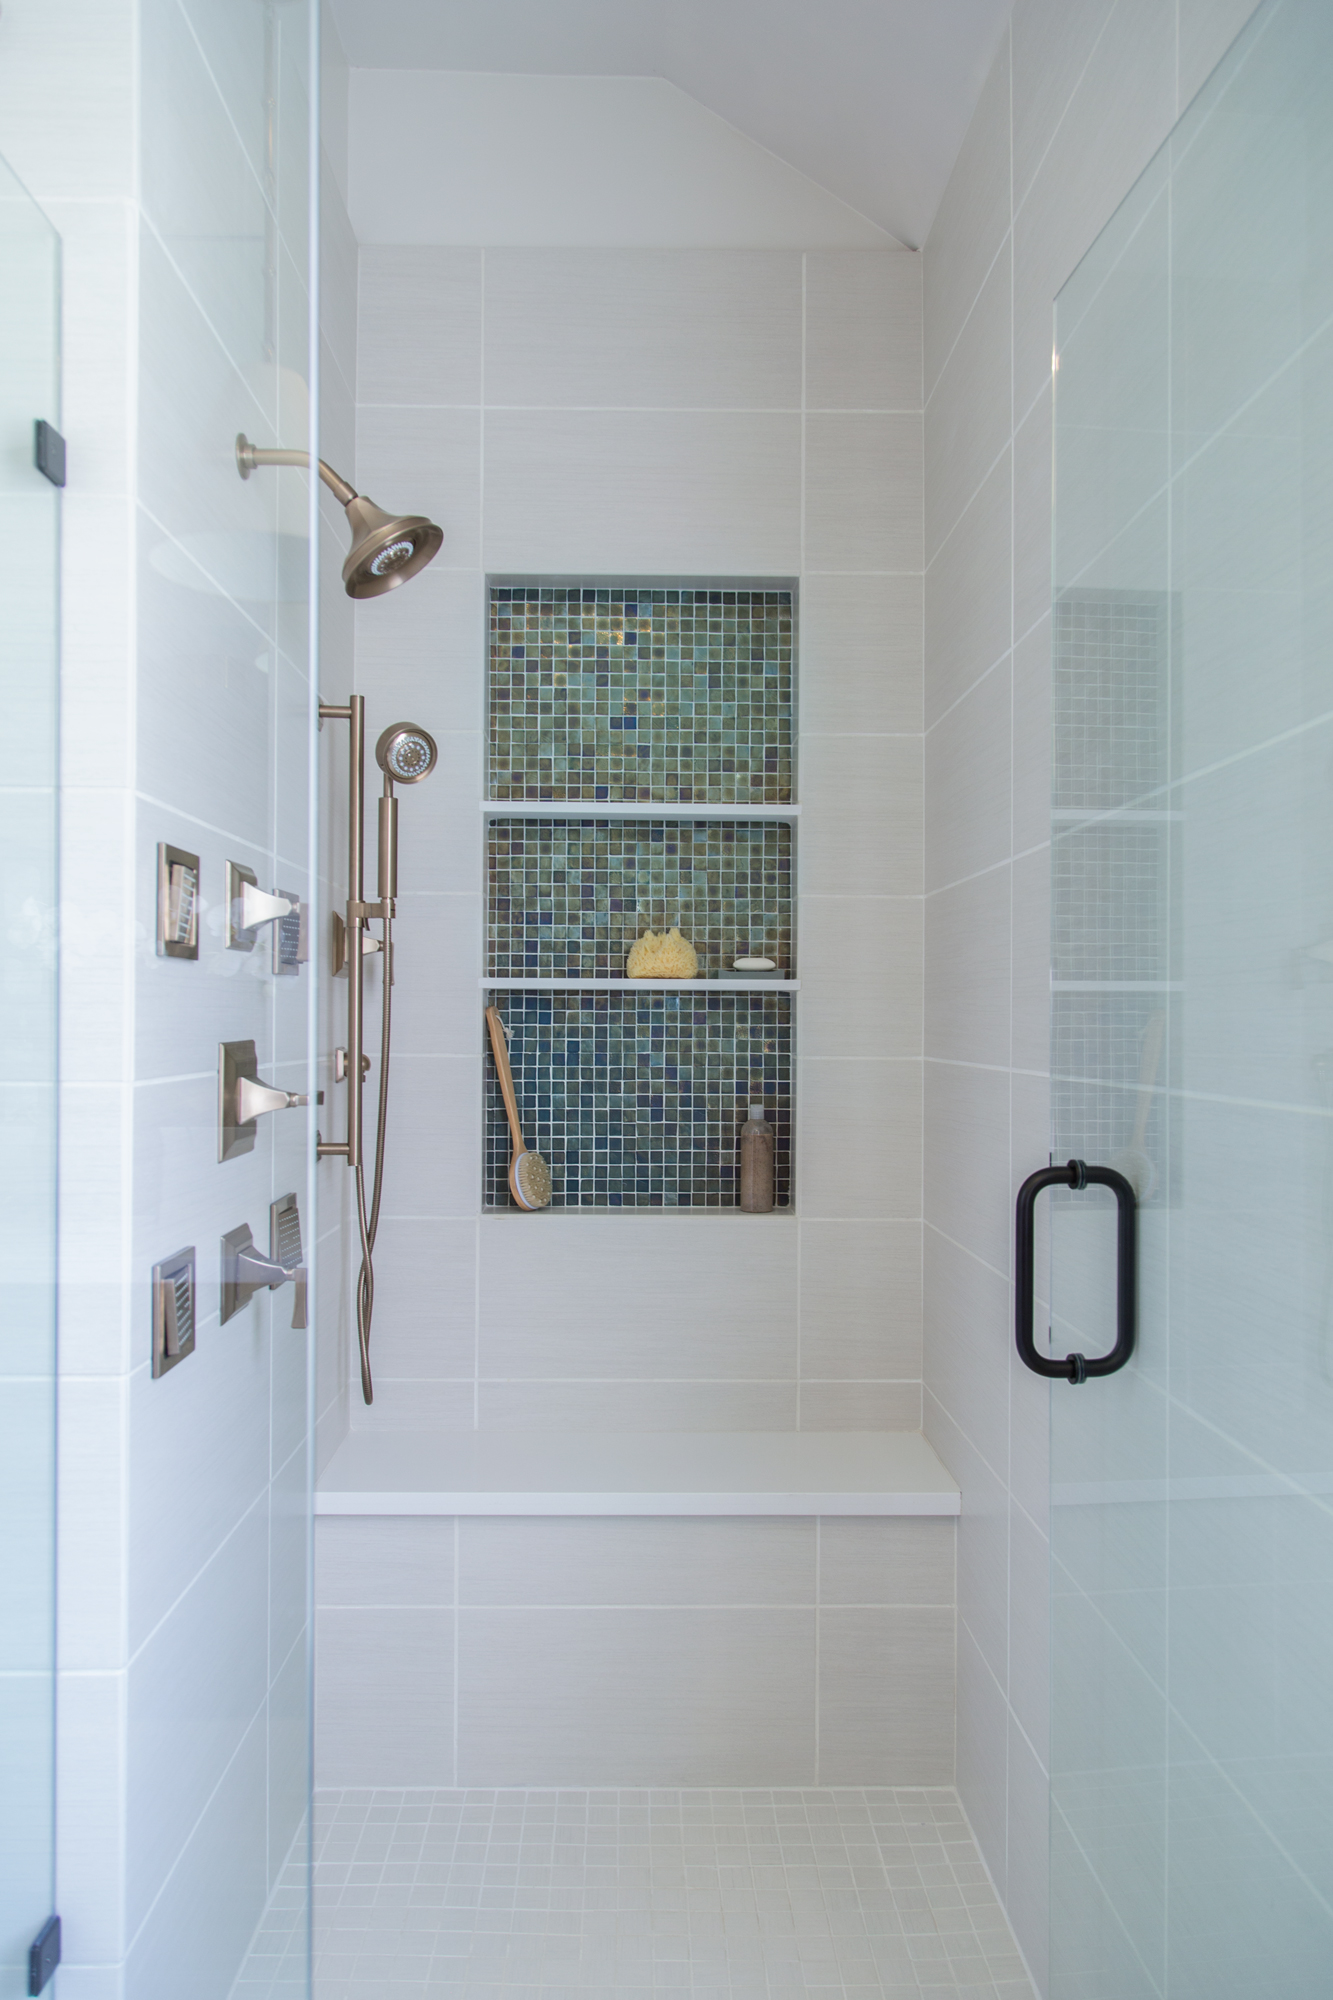 Luxury shower with bench and oversized shampoo niche and body sprays,  Designer: Carla Aston, Photographer: Tori Aston